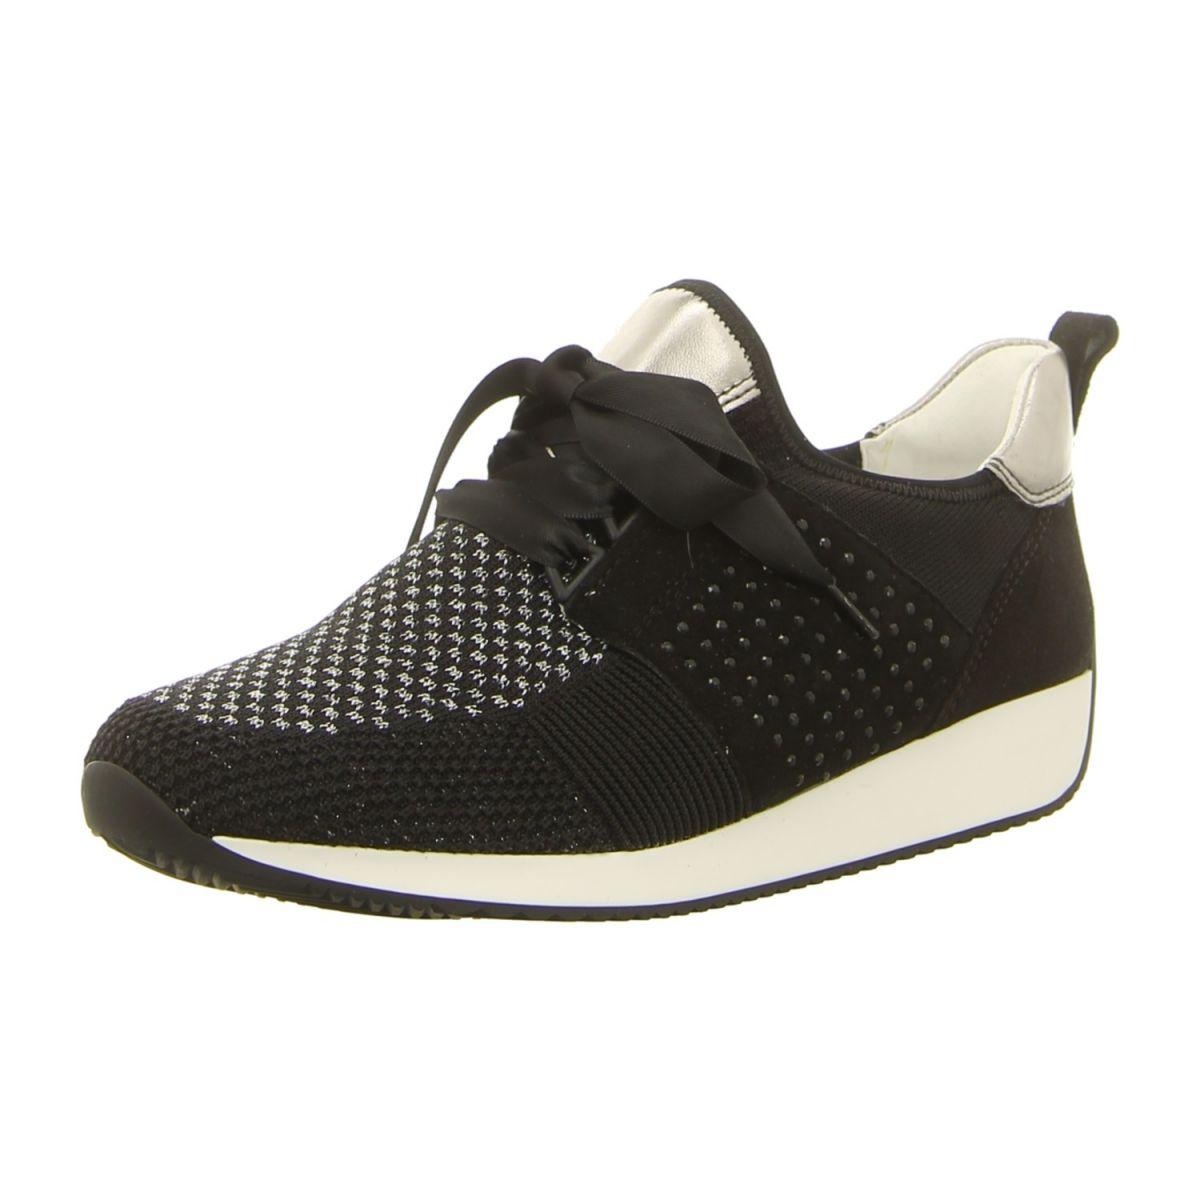 NEU: Ara Sneaker Lissabon Fusion4 12 34036 07 schwarz